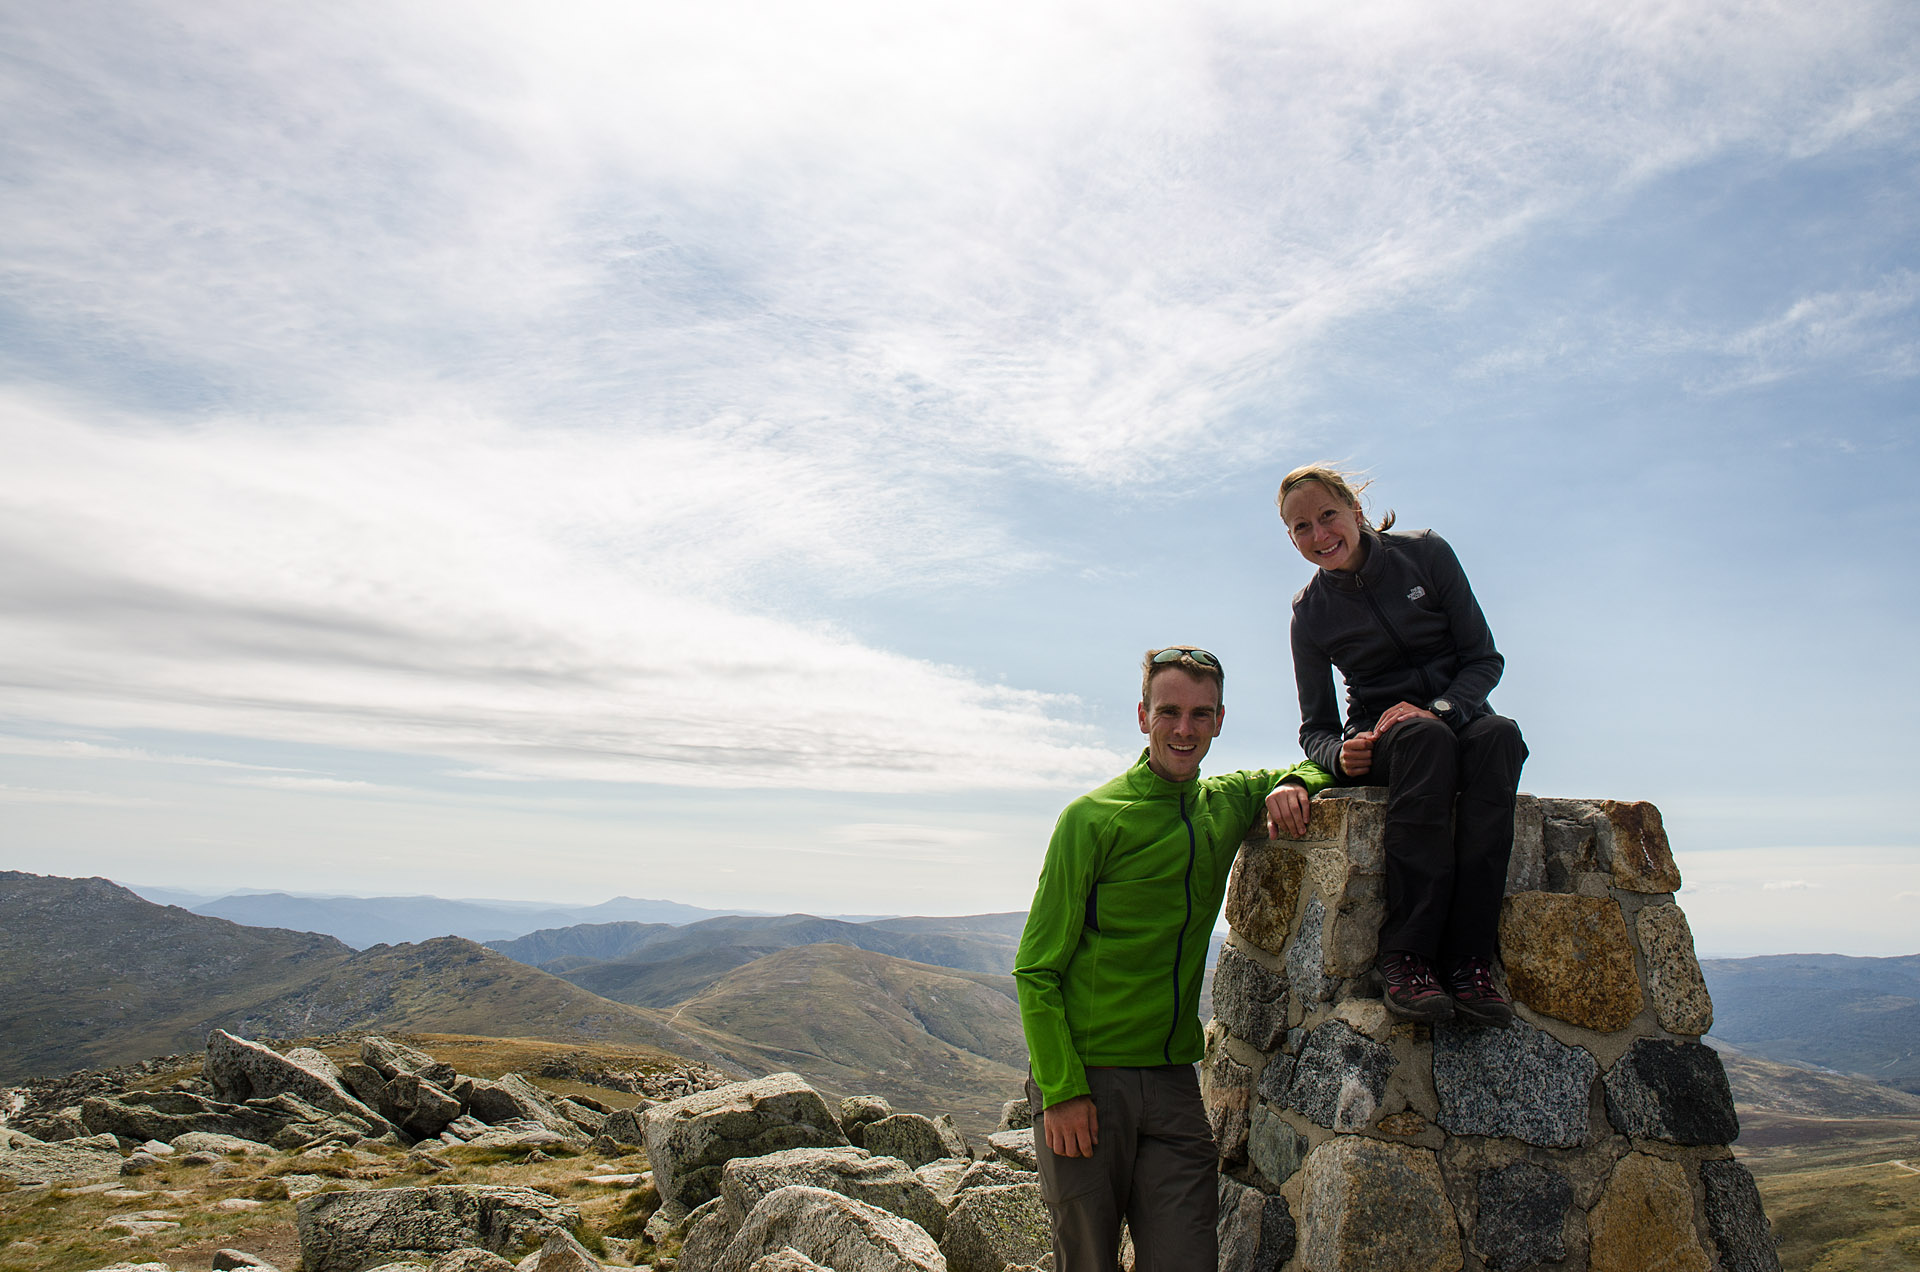 Mt. Kosciuszko summit (7,310 feet)